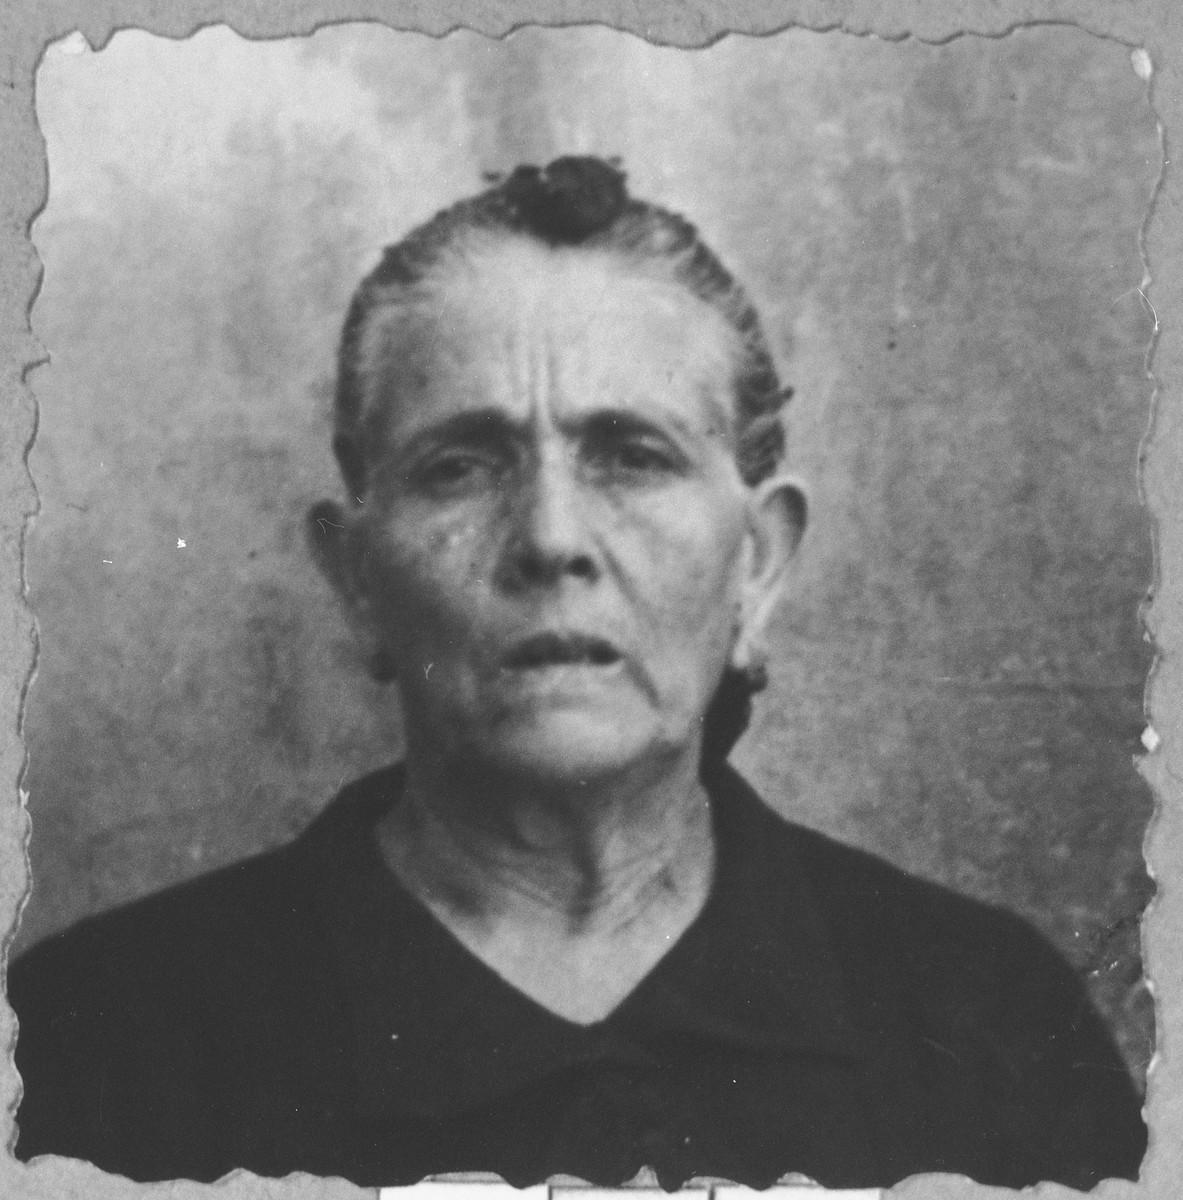 Portrait of Luna Kalderon, wife of Mushon Kaleron.  She lived at Dalmatinska 65 in Bitola.